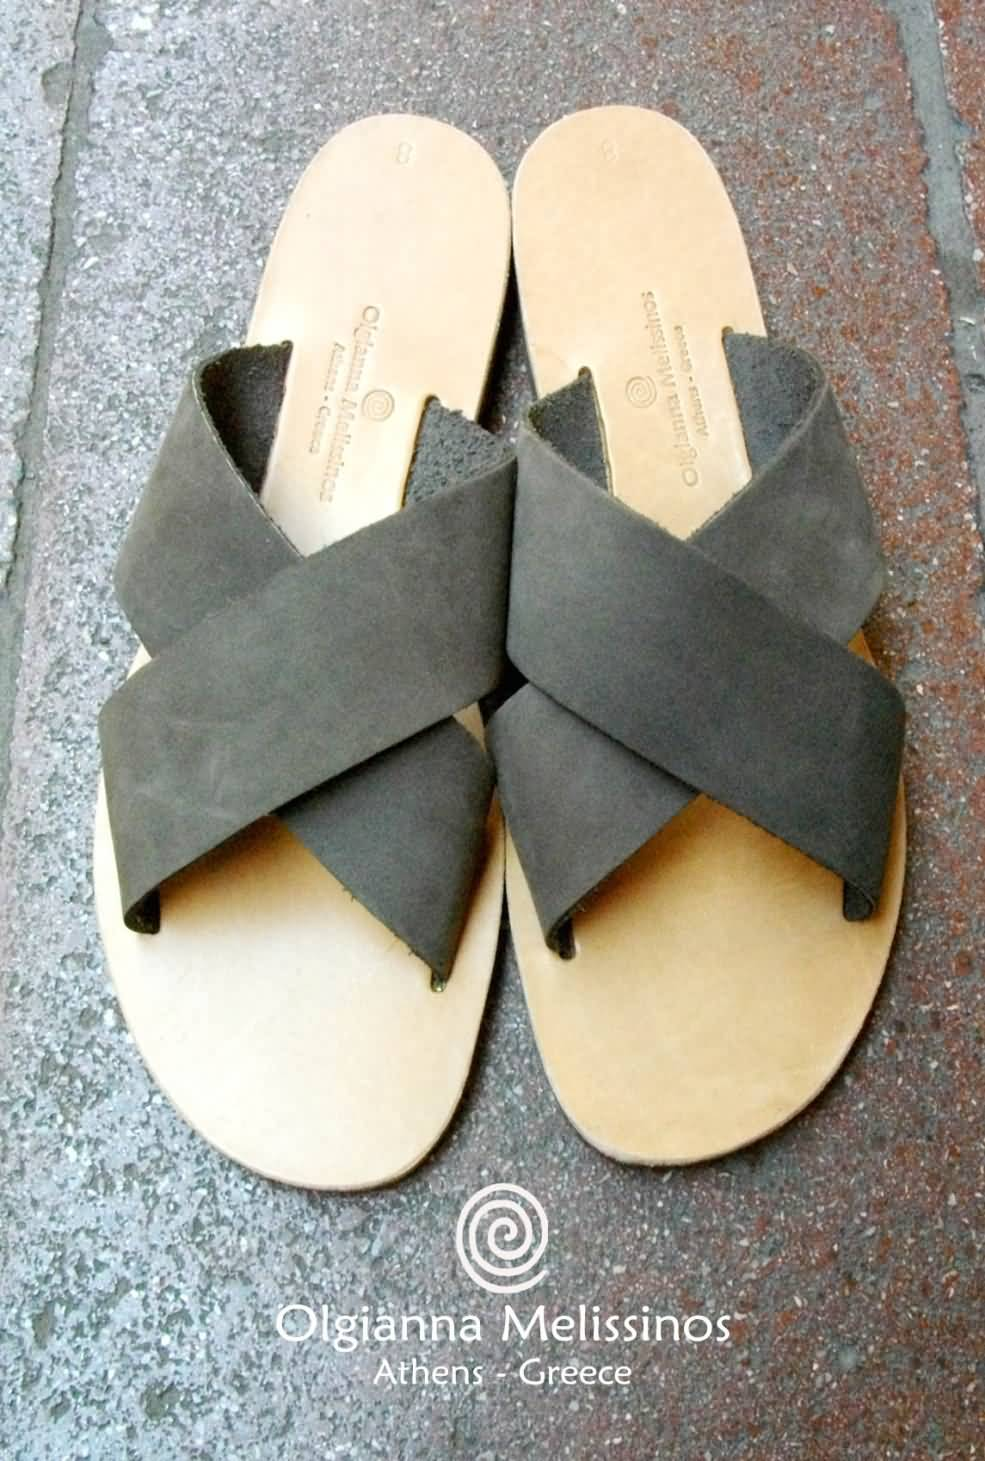 Handmade Sandals - CHI NUBUCK 29PK